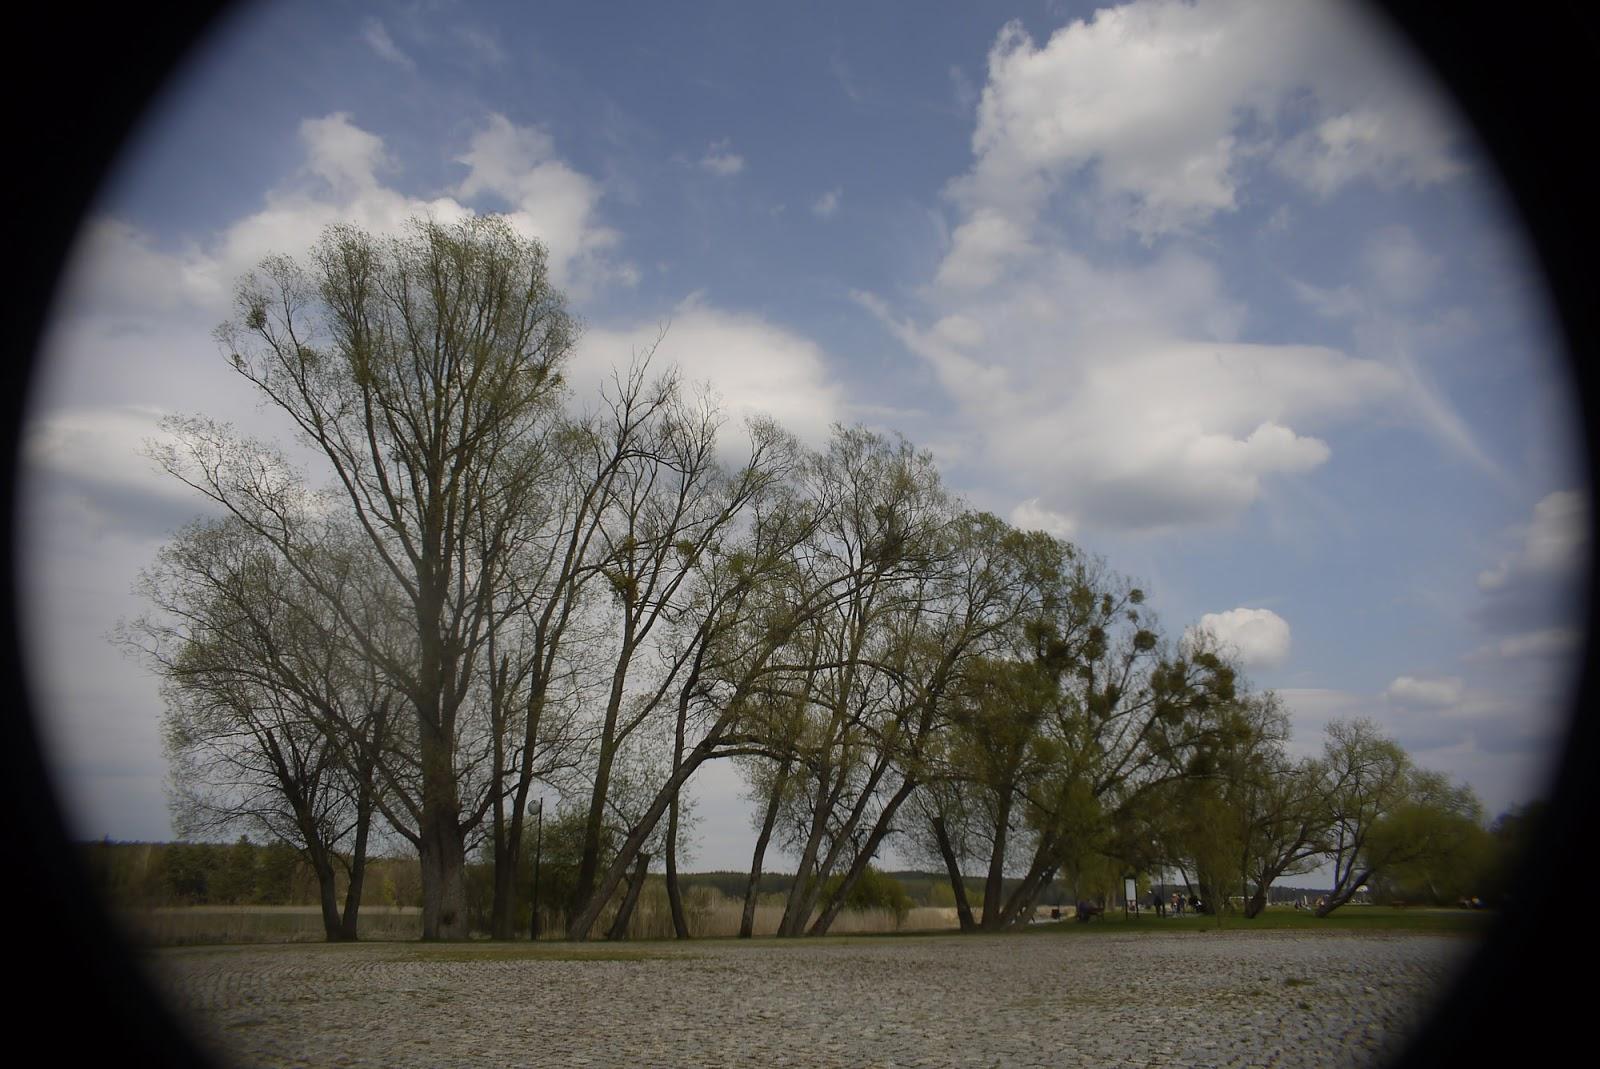 Cosmicar 12.5/1.9 @5.6 - landscape (2:3 crop).